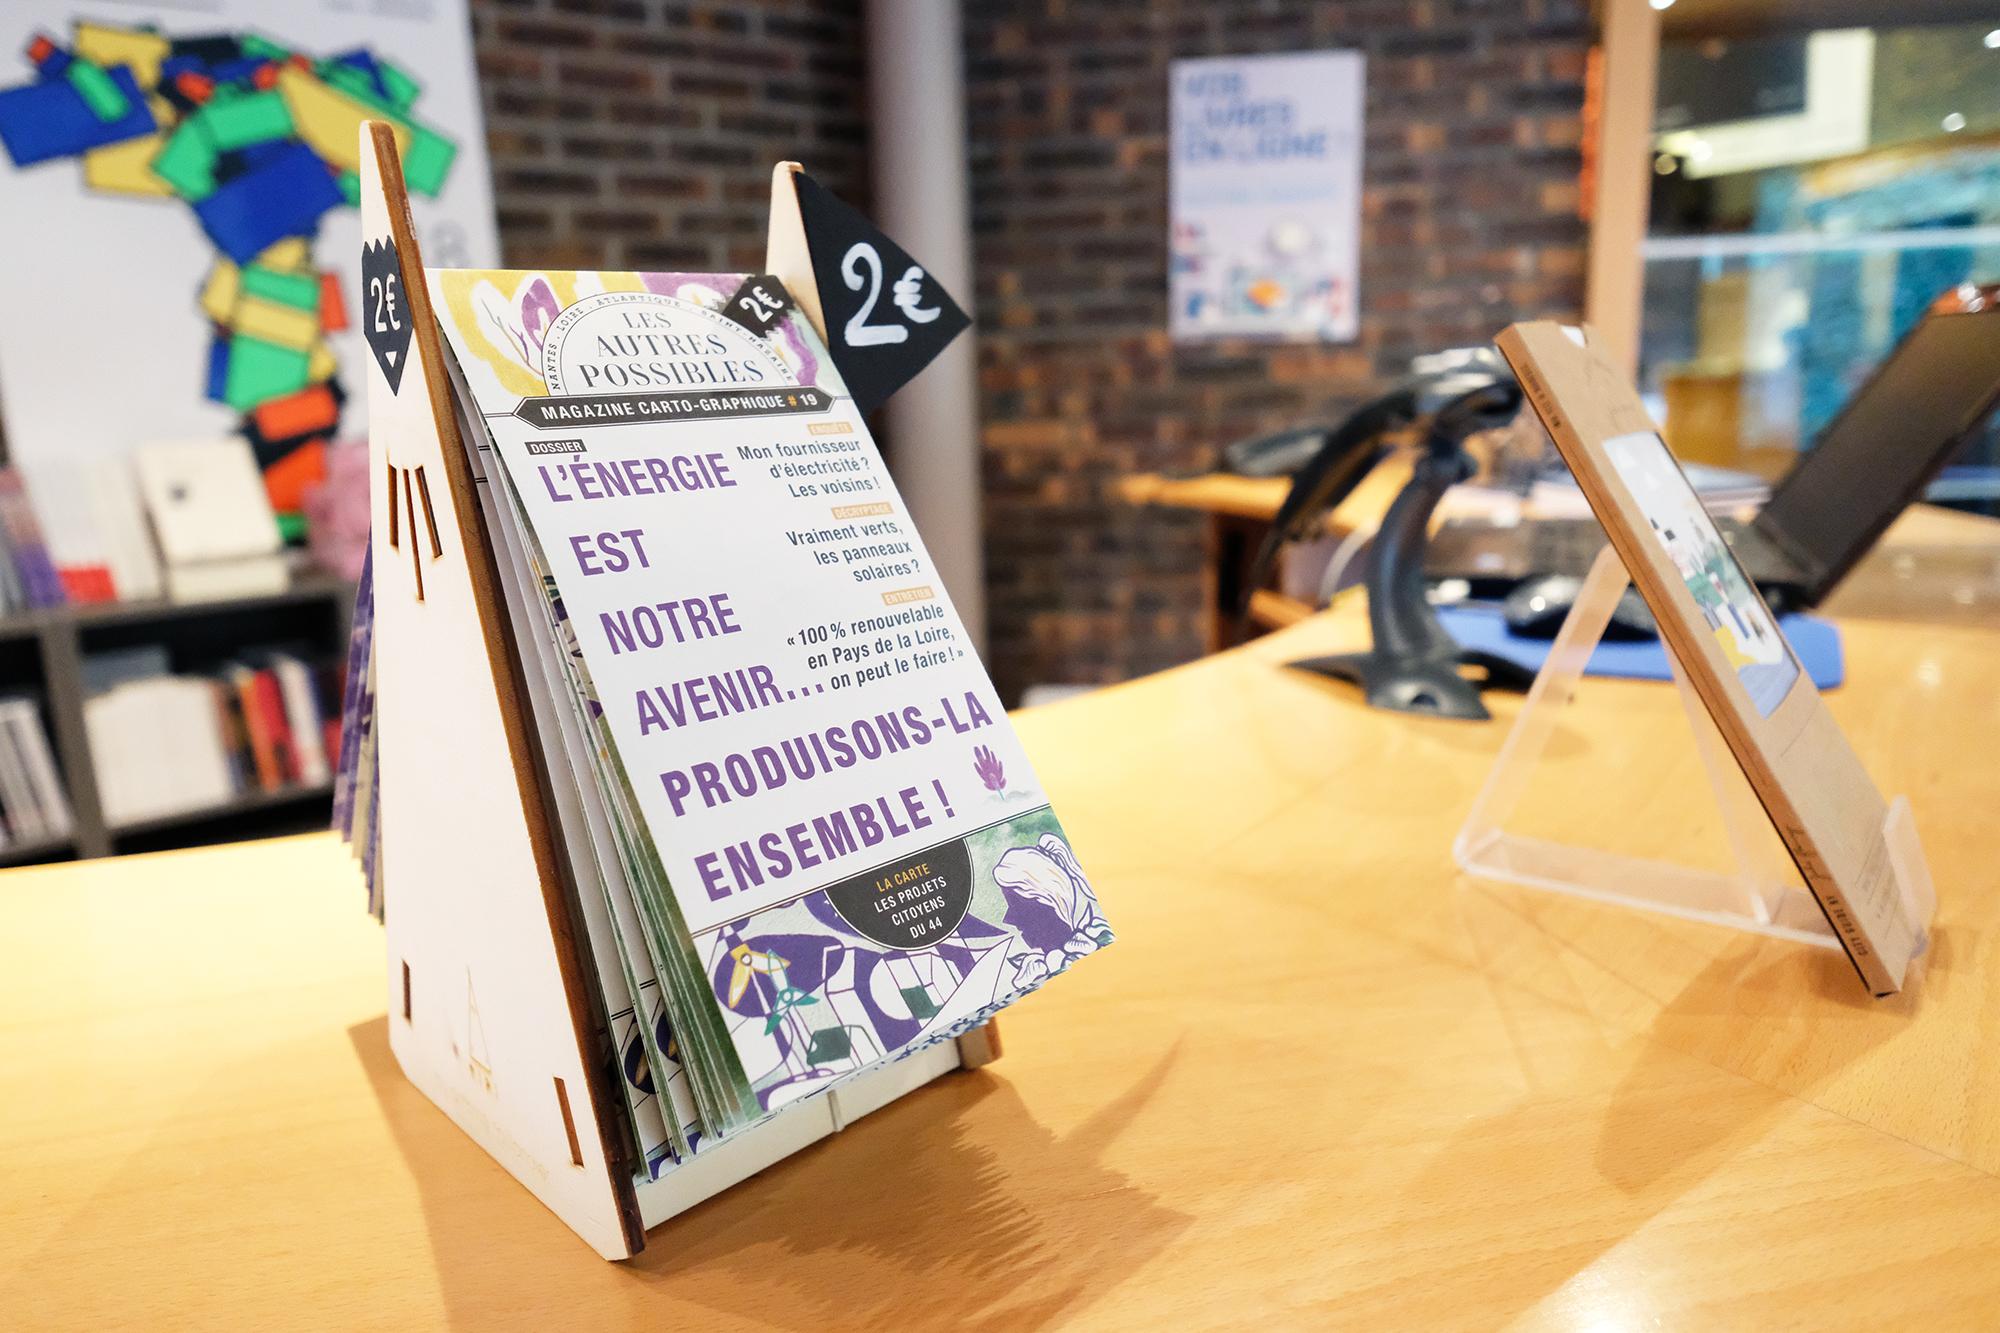 Le Grand T - Librairie - Carte projets citoyens